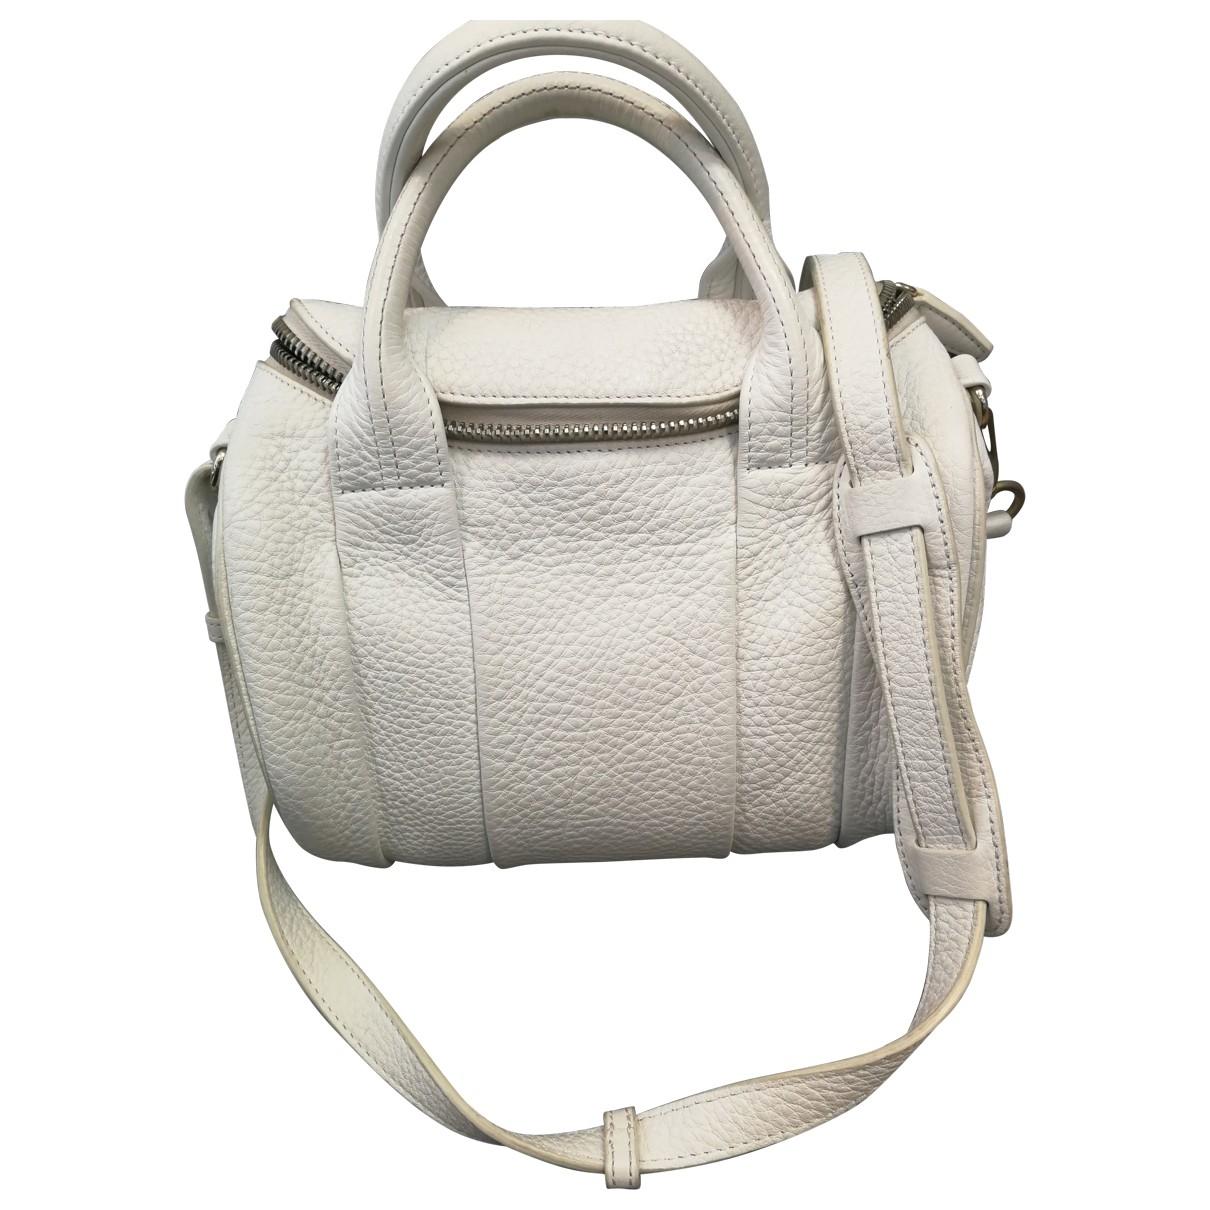 Alexander Wang Rockie Handtasche in  Weiss Leder